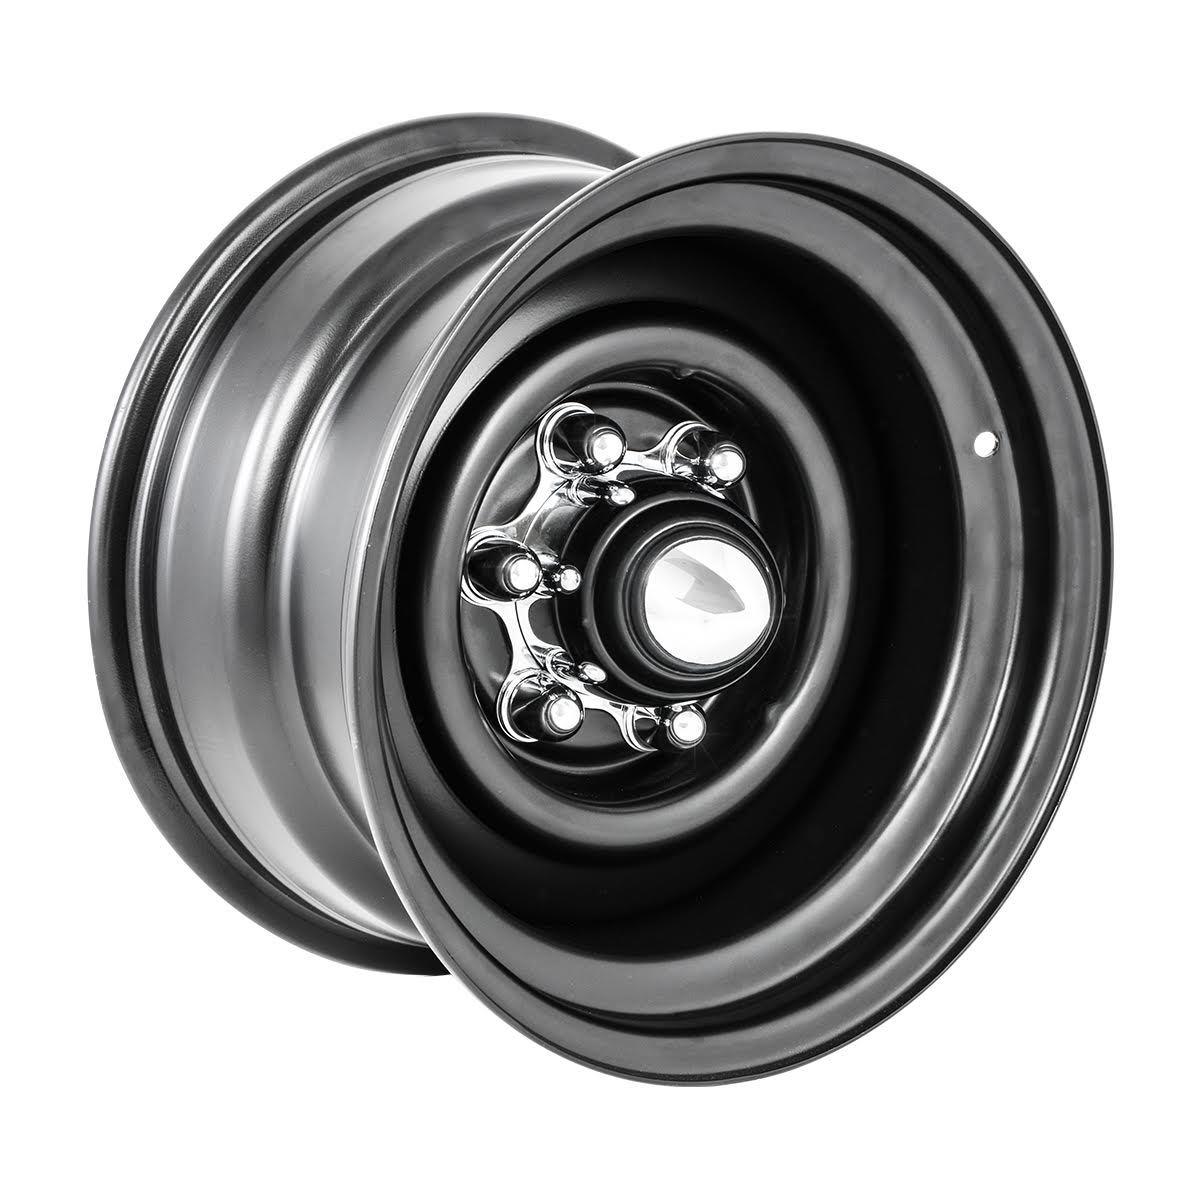 All Chevy chevy c10 wheel bolt pattern : 6 Lug Chrome Spider Center Cap 1947-72 Chevy GMC Truck 6 x 5-1/2 ...